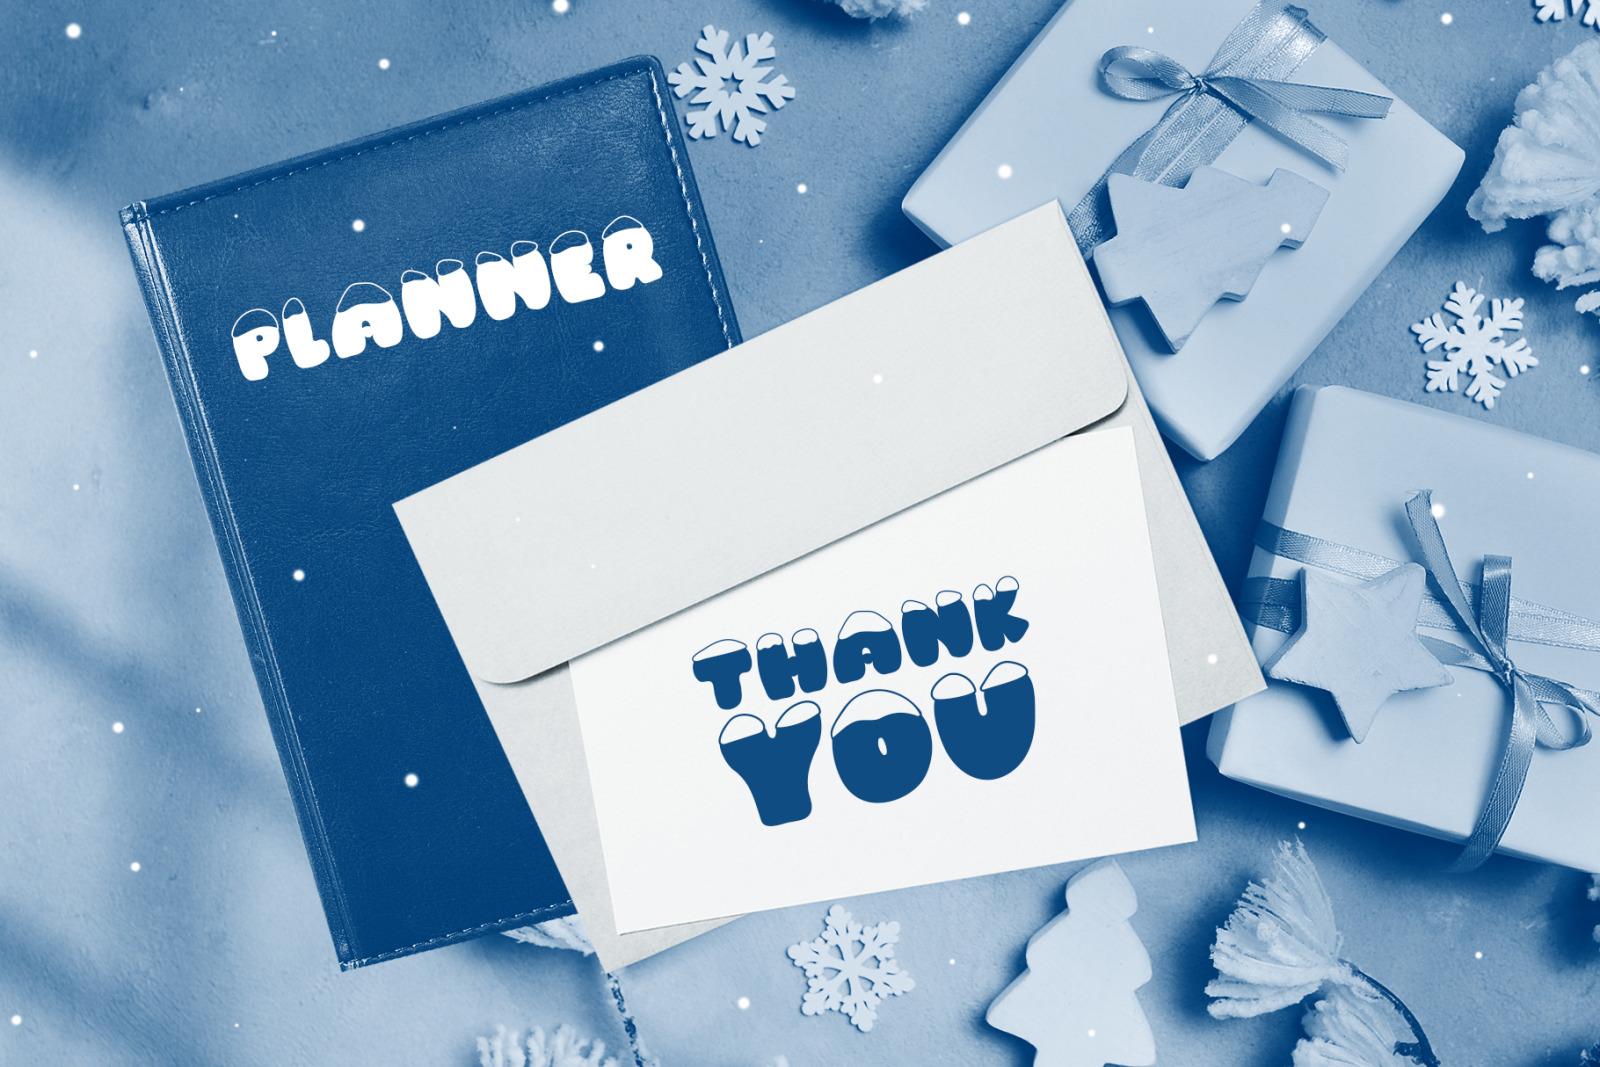 Frosty Joy Hand Drawn Display Font